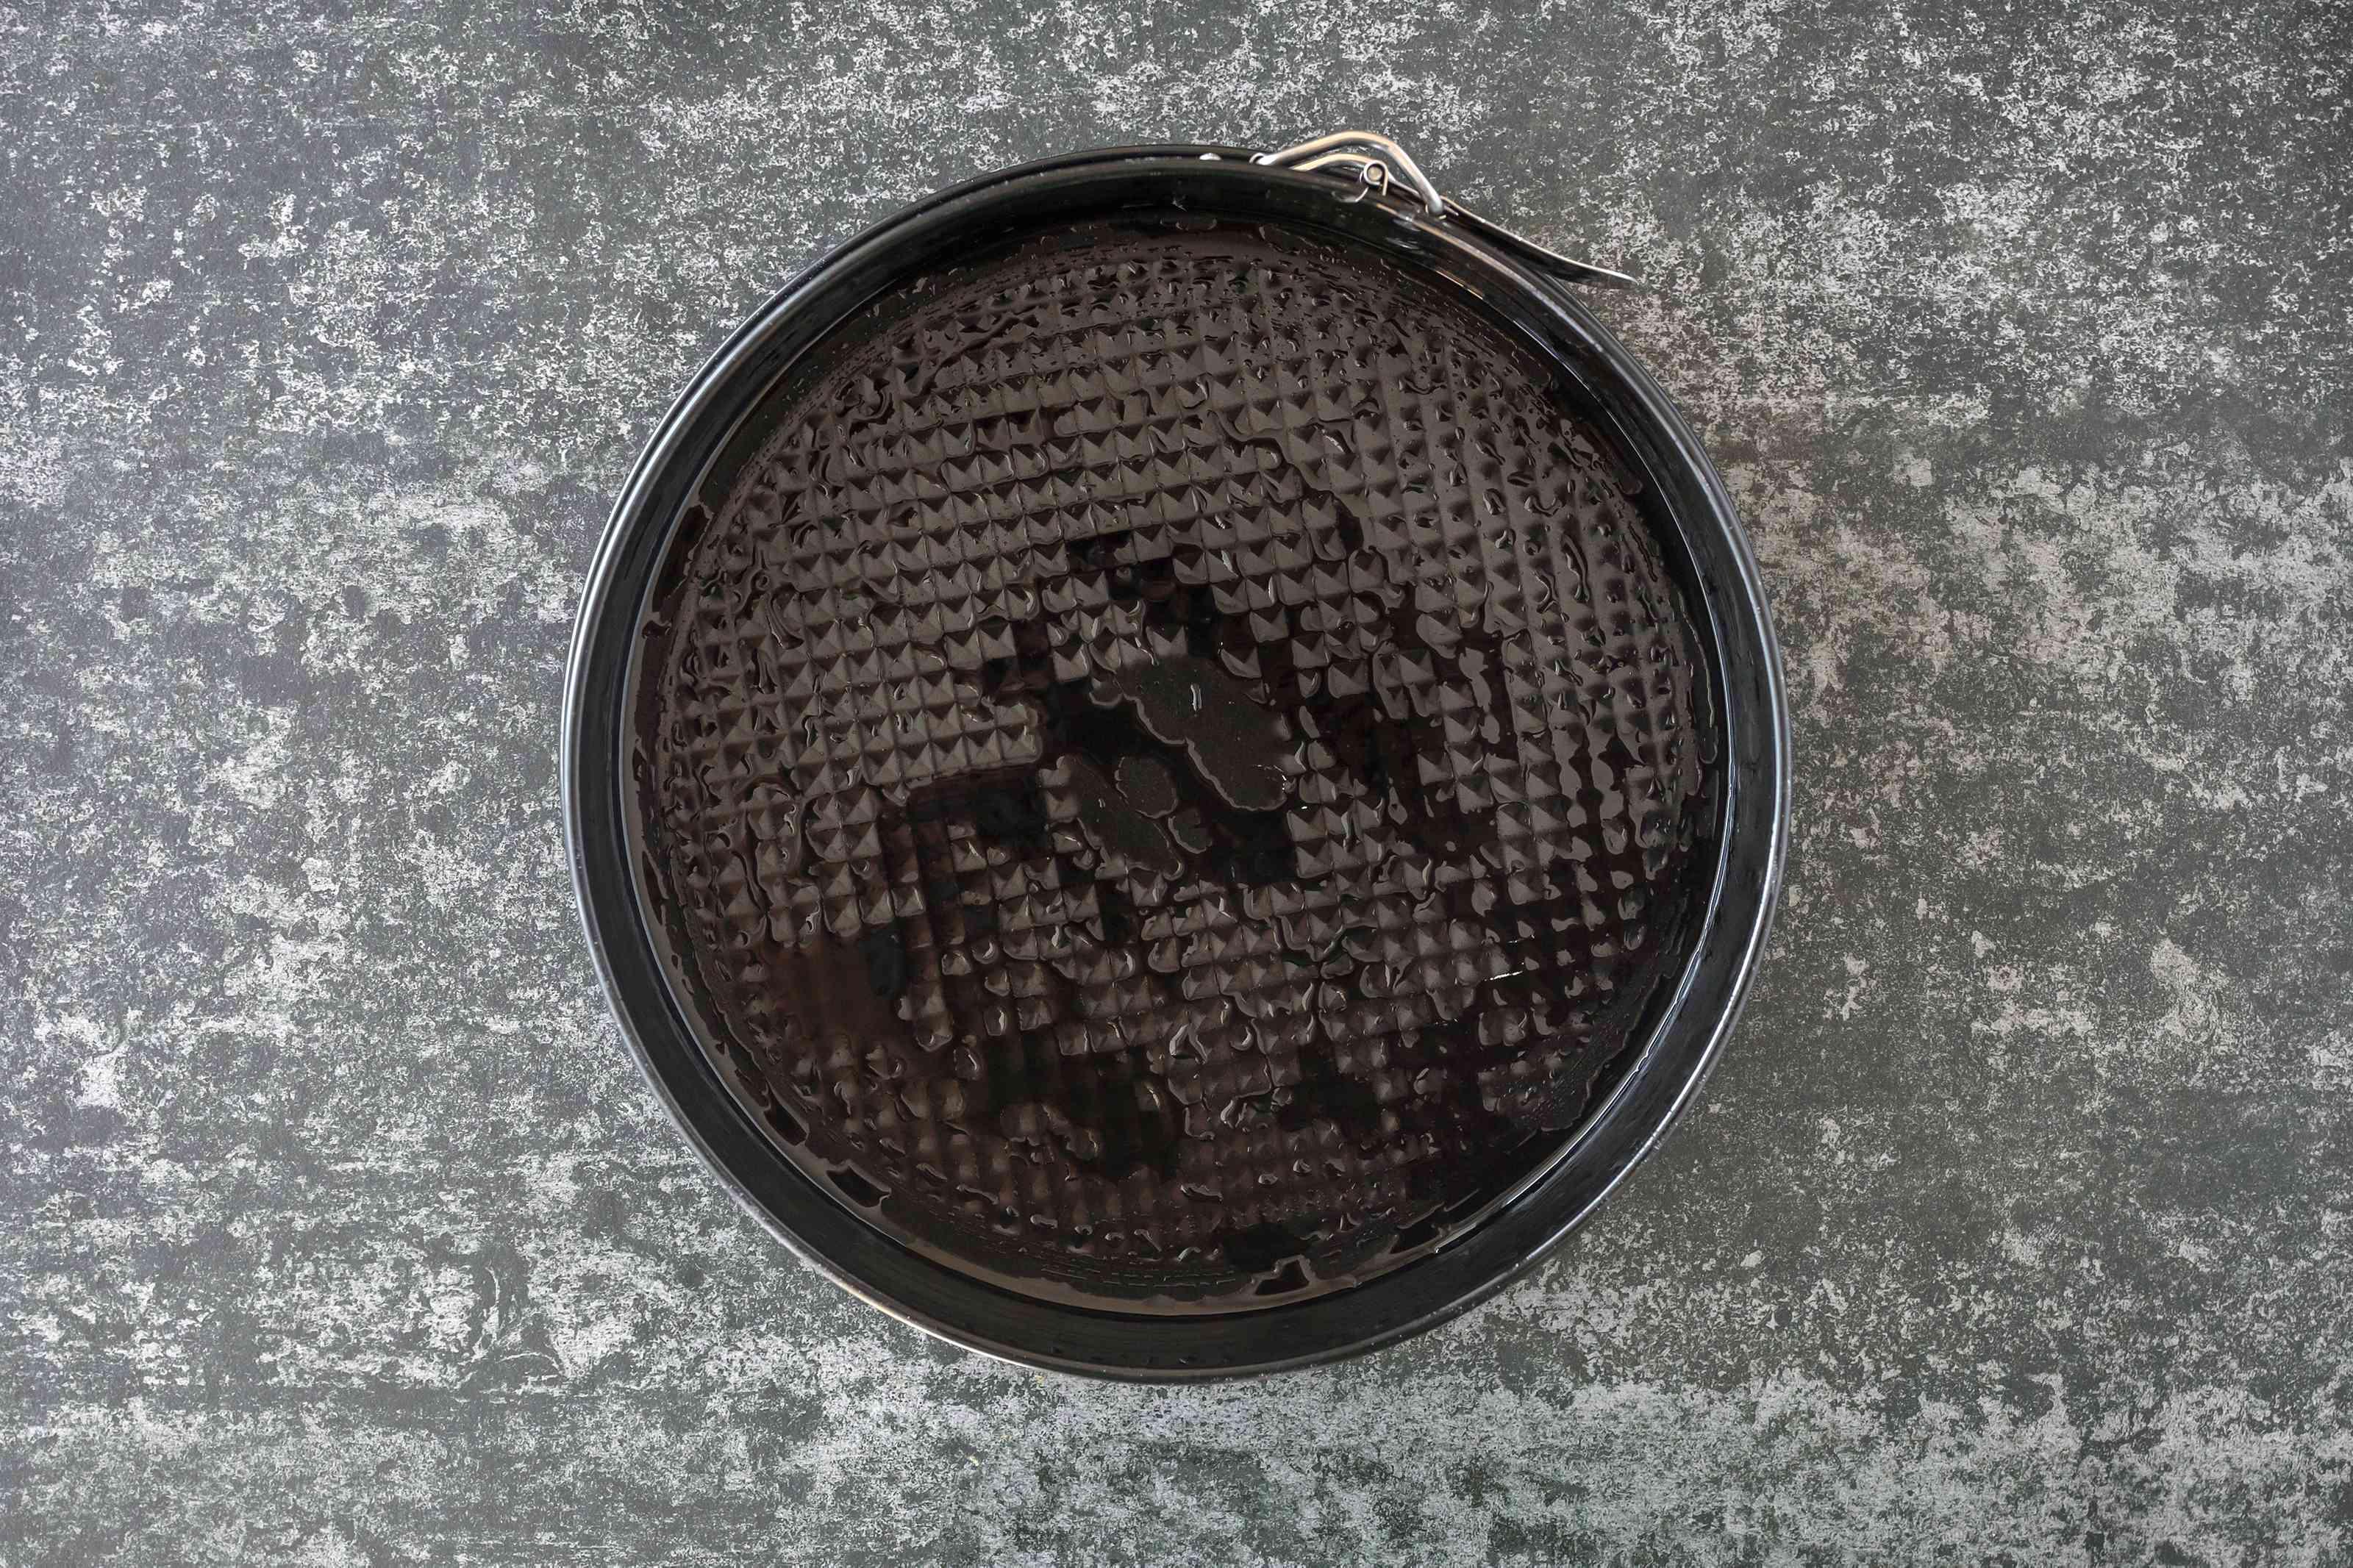 Lightly coat pan